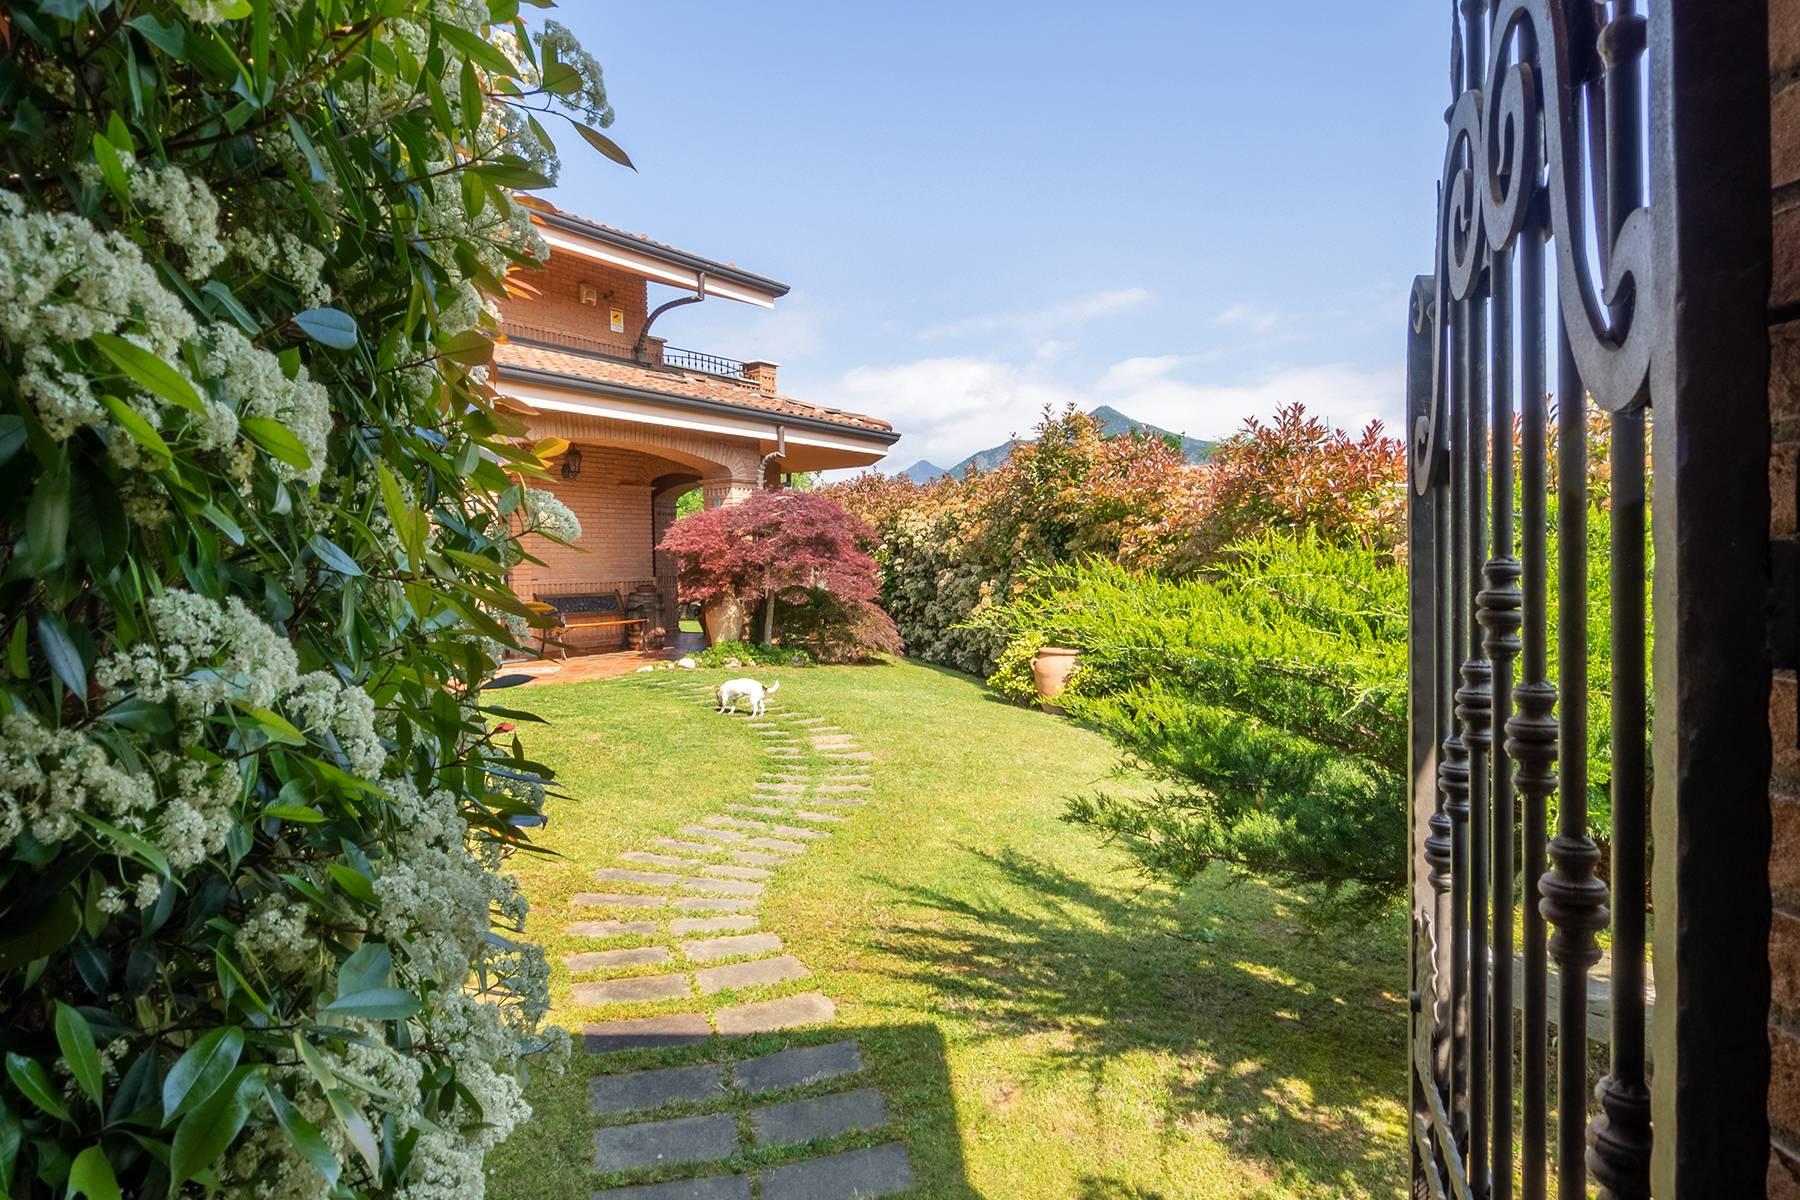 Villa in Vendita a Rosta: 5 locali, 182 mq - Foto 2